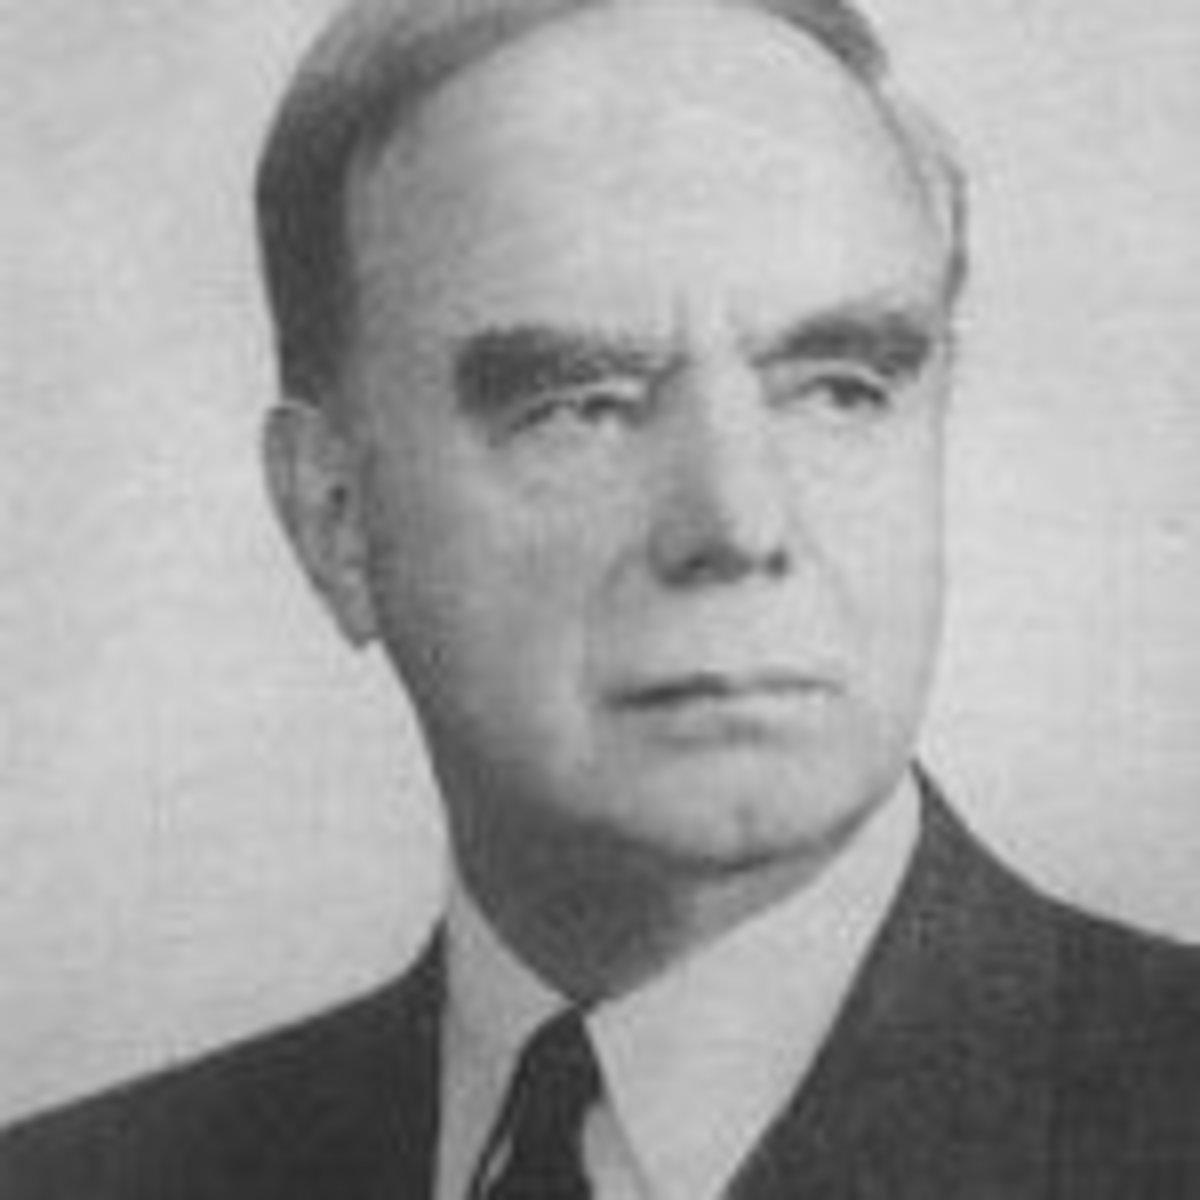 Anton Flettner, arguably the best helicopter designer of World War II